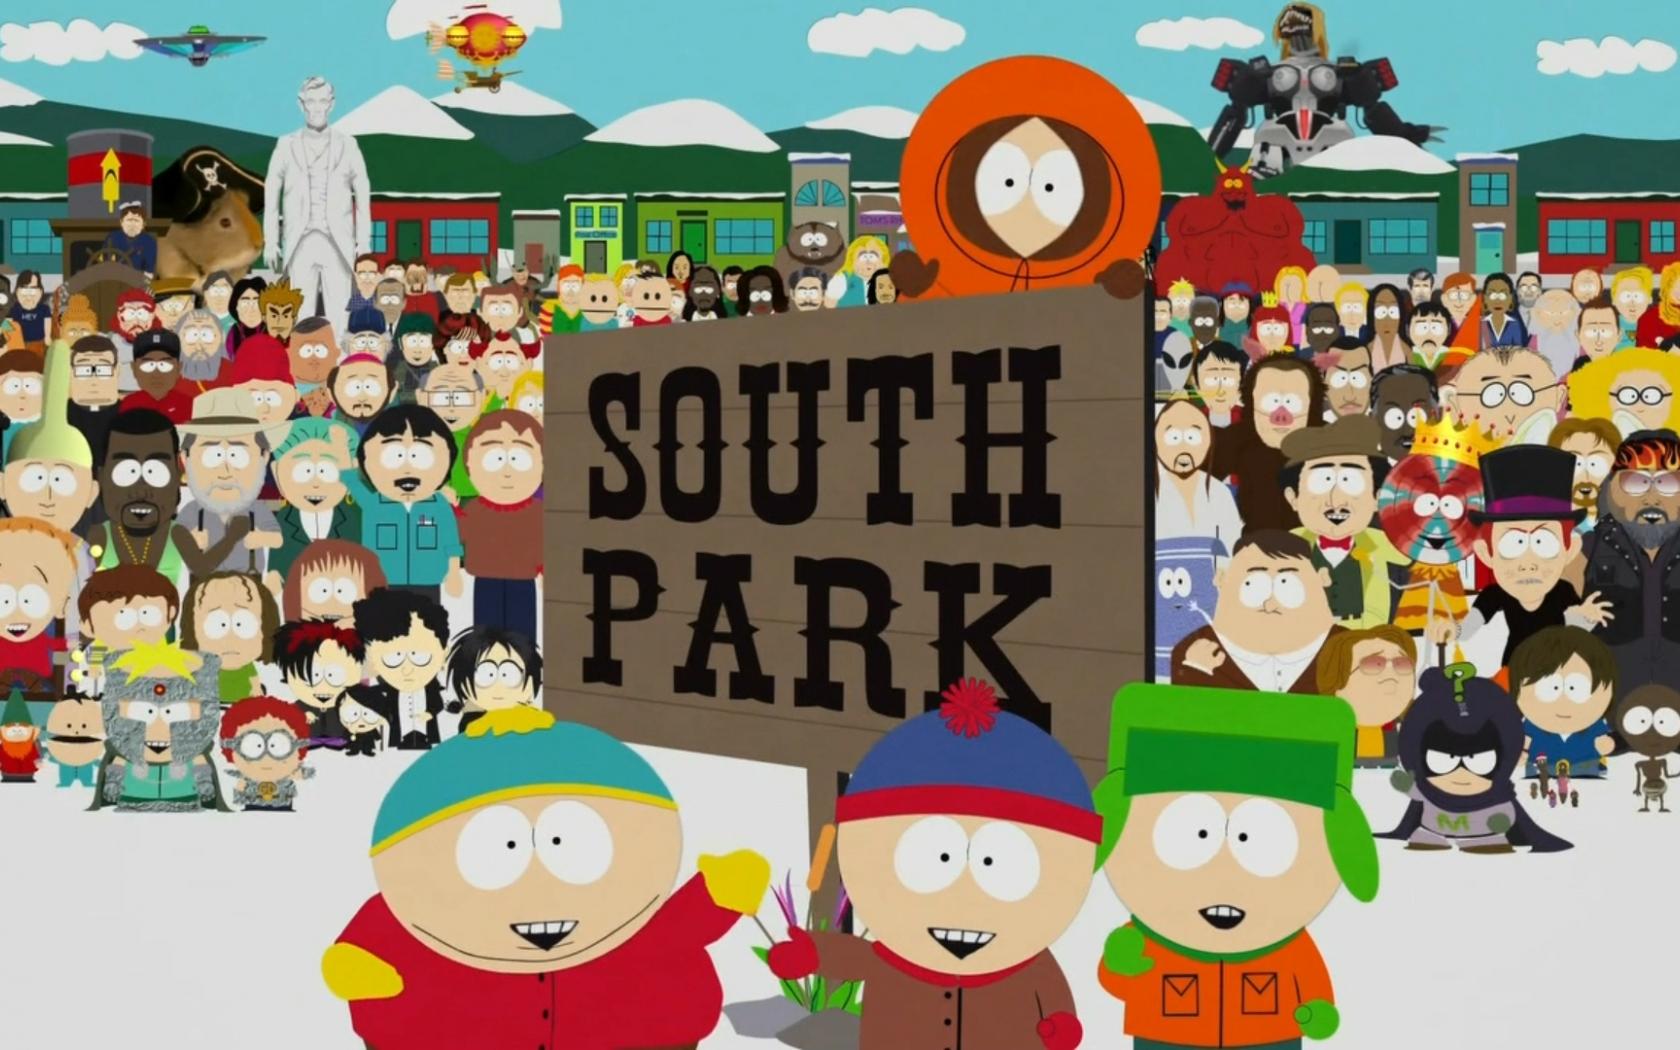 Free Download South Park Desktop Wallpaper Hd Cool Wallpapers